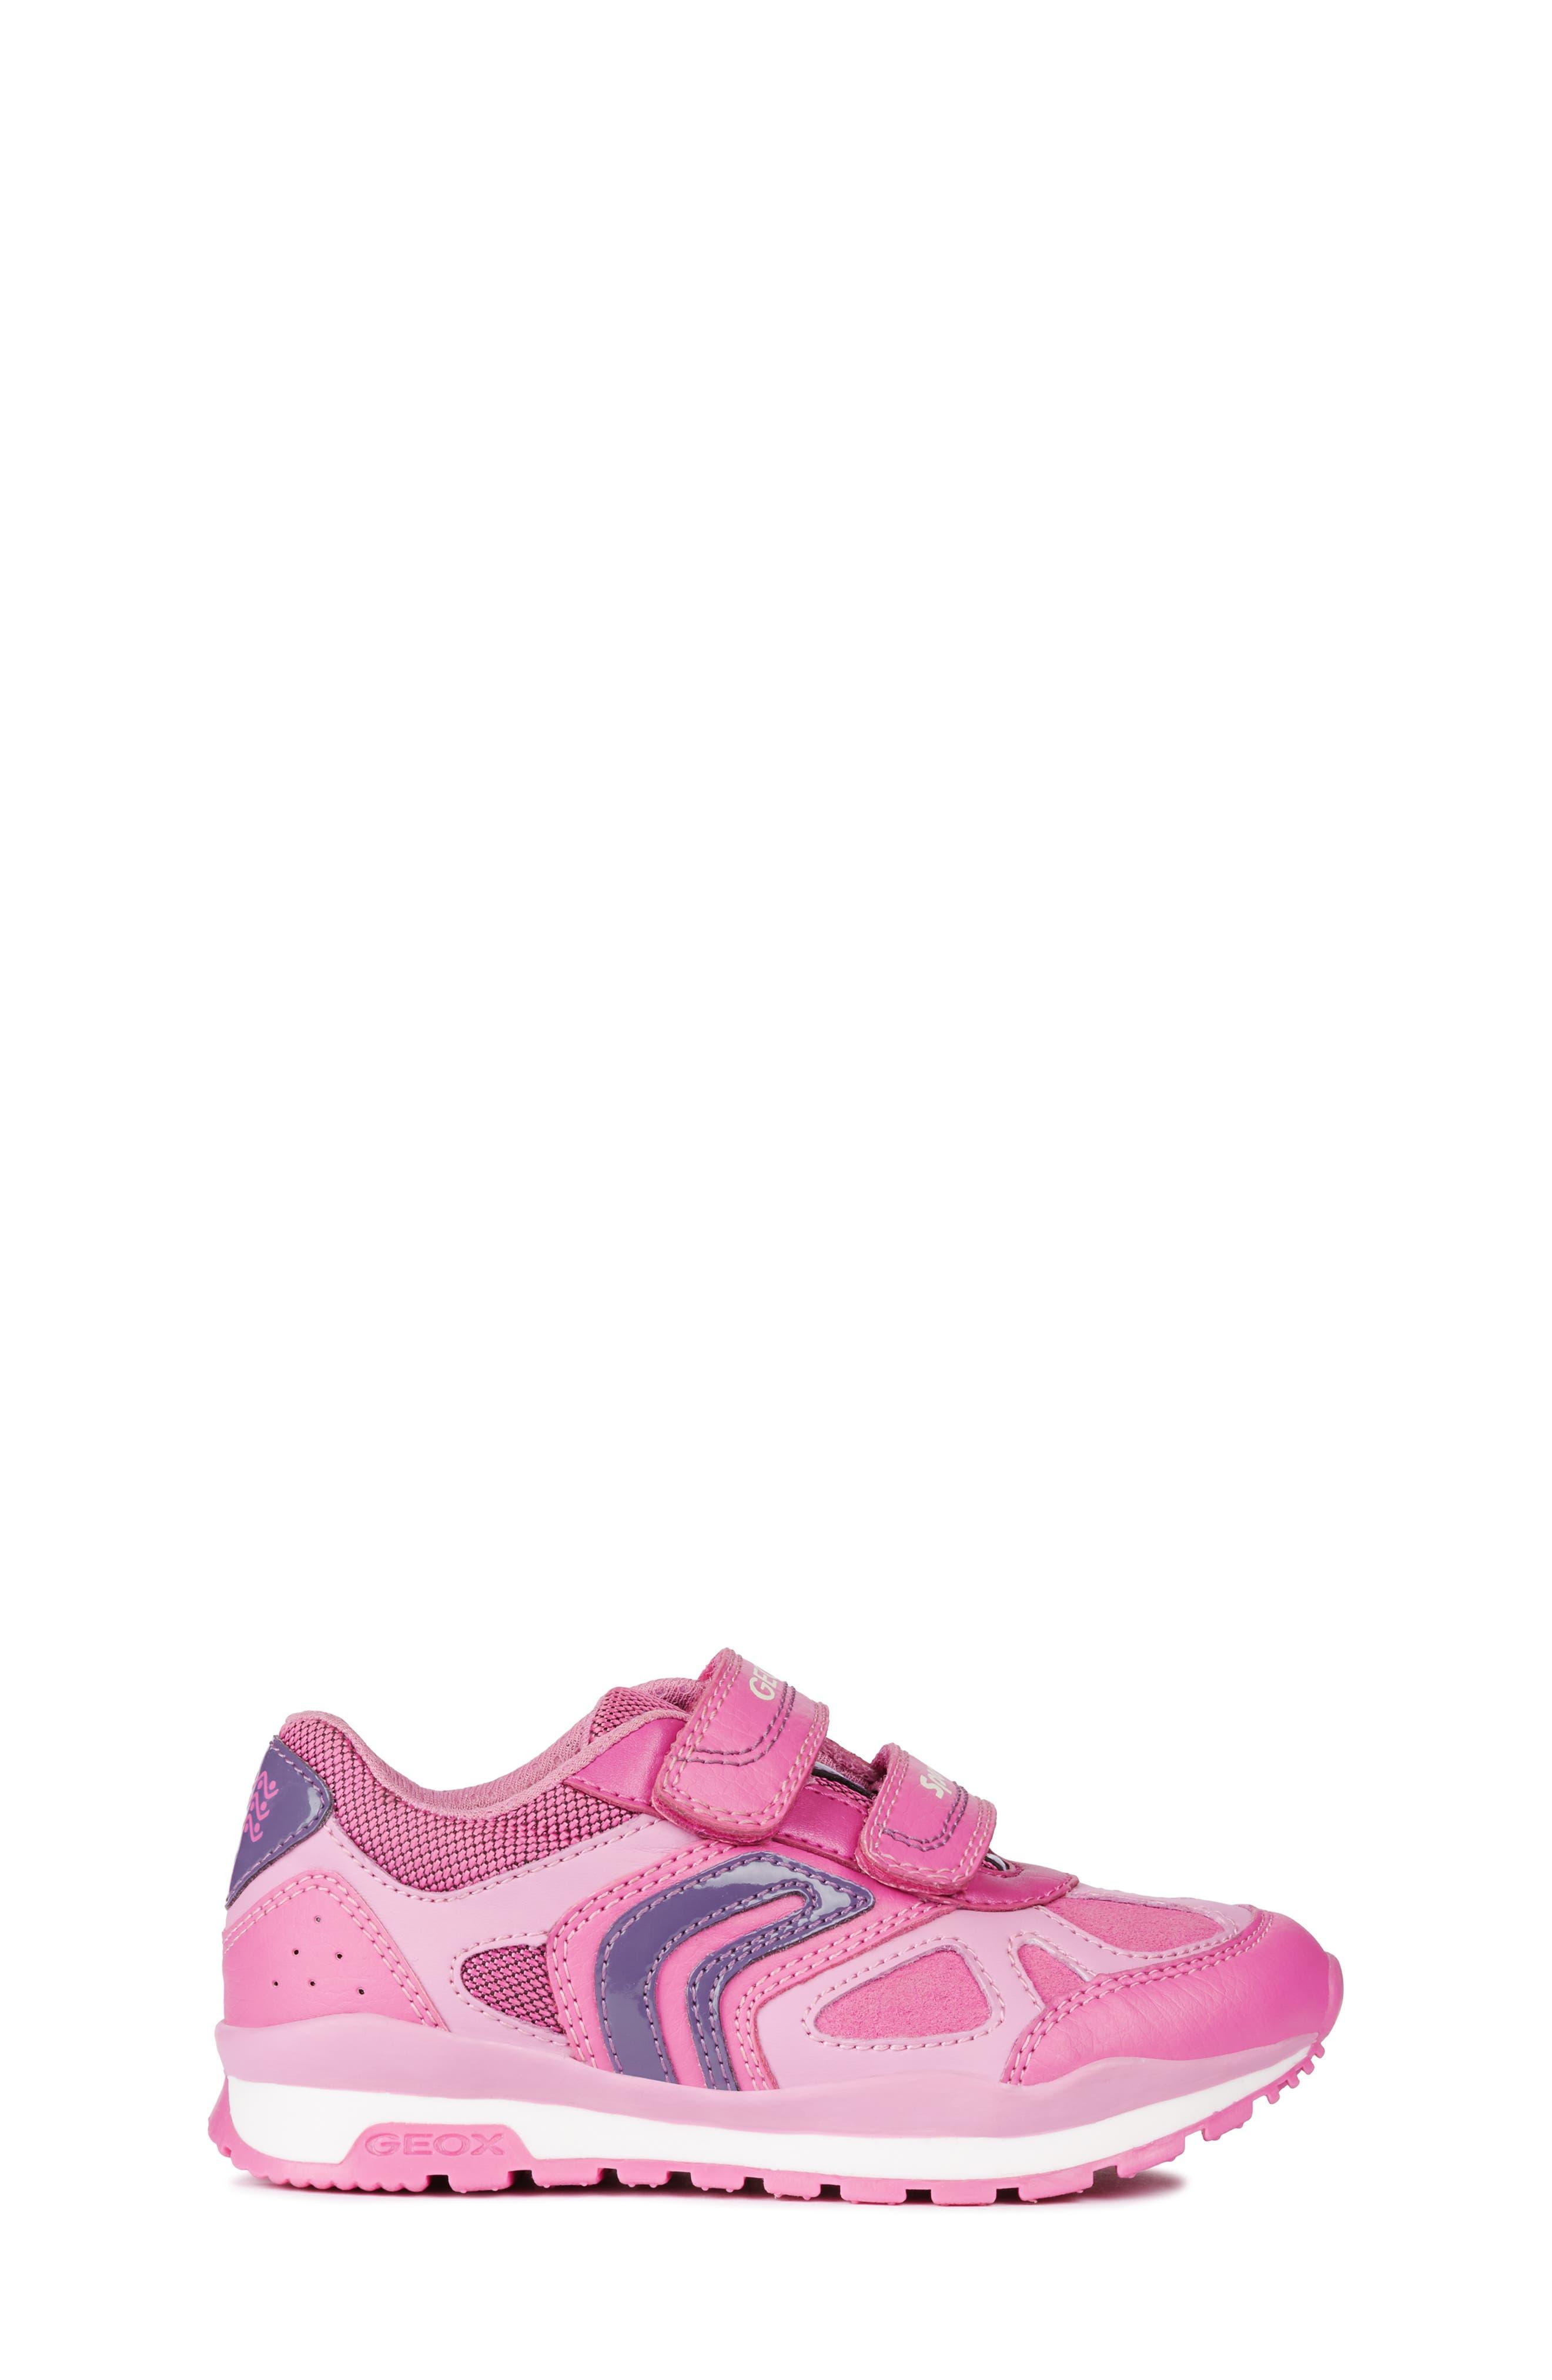 Pavel Sneaker,                             Alternate thumbnail 3, color,                             FUCHSIA/PINK